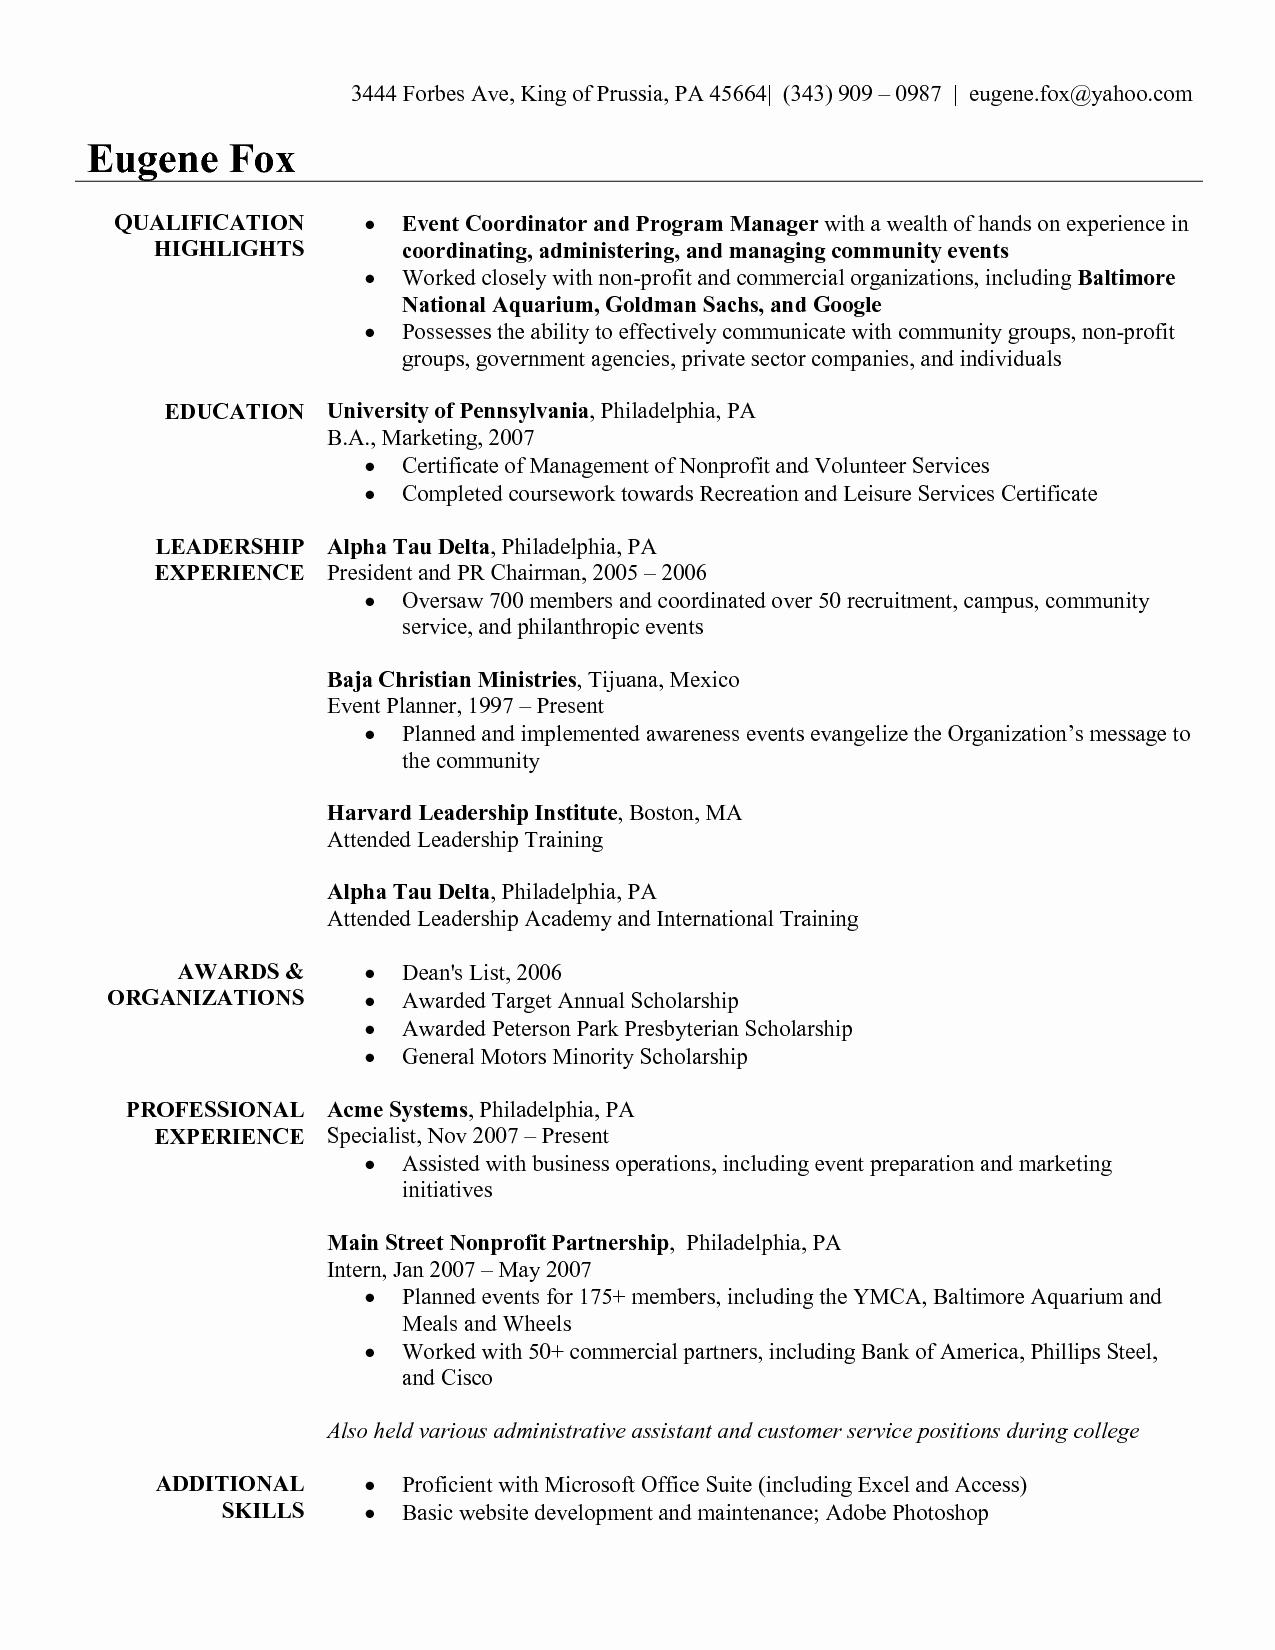 Special events Coordinator Resume Portablegasgrillweber